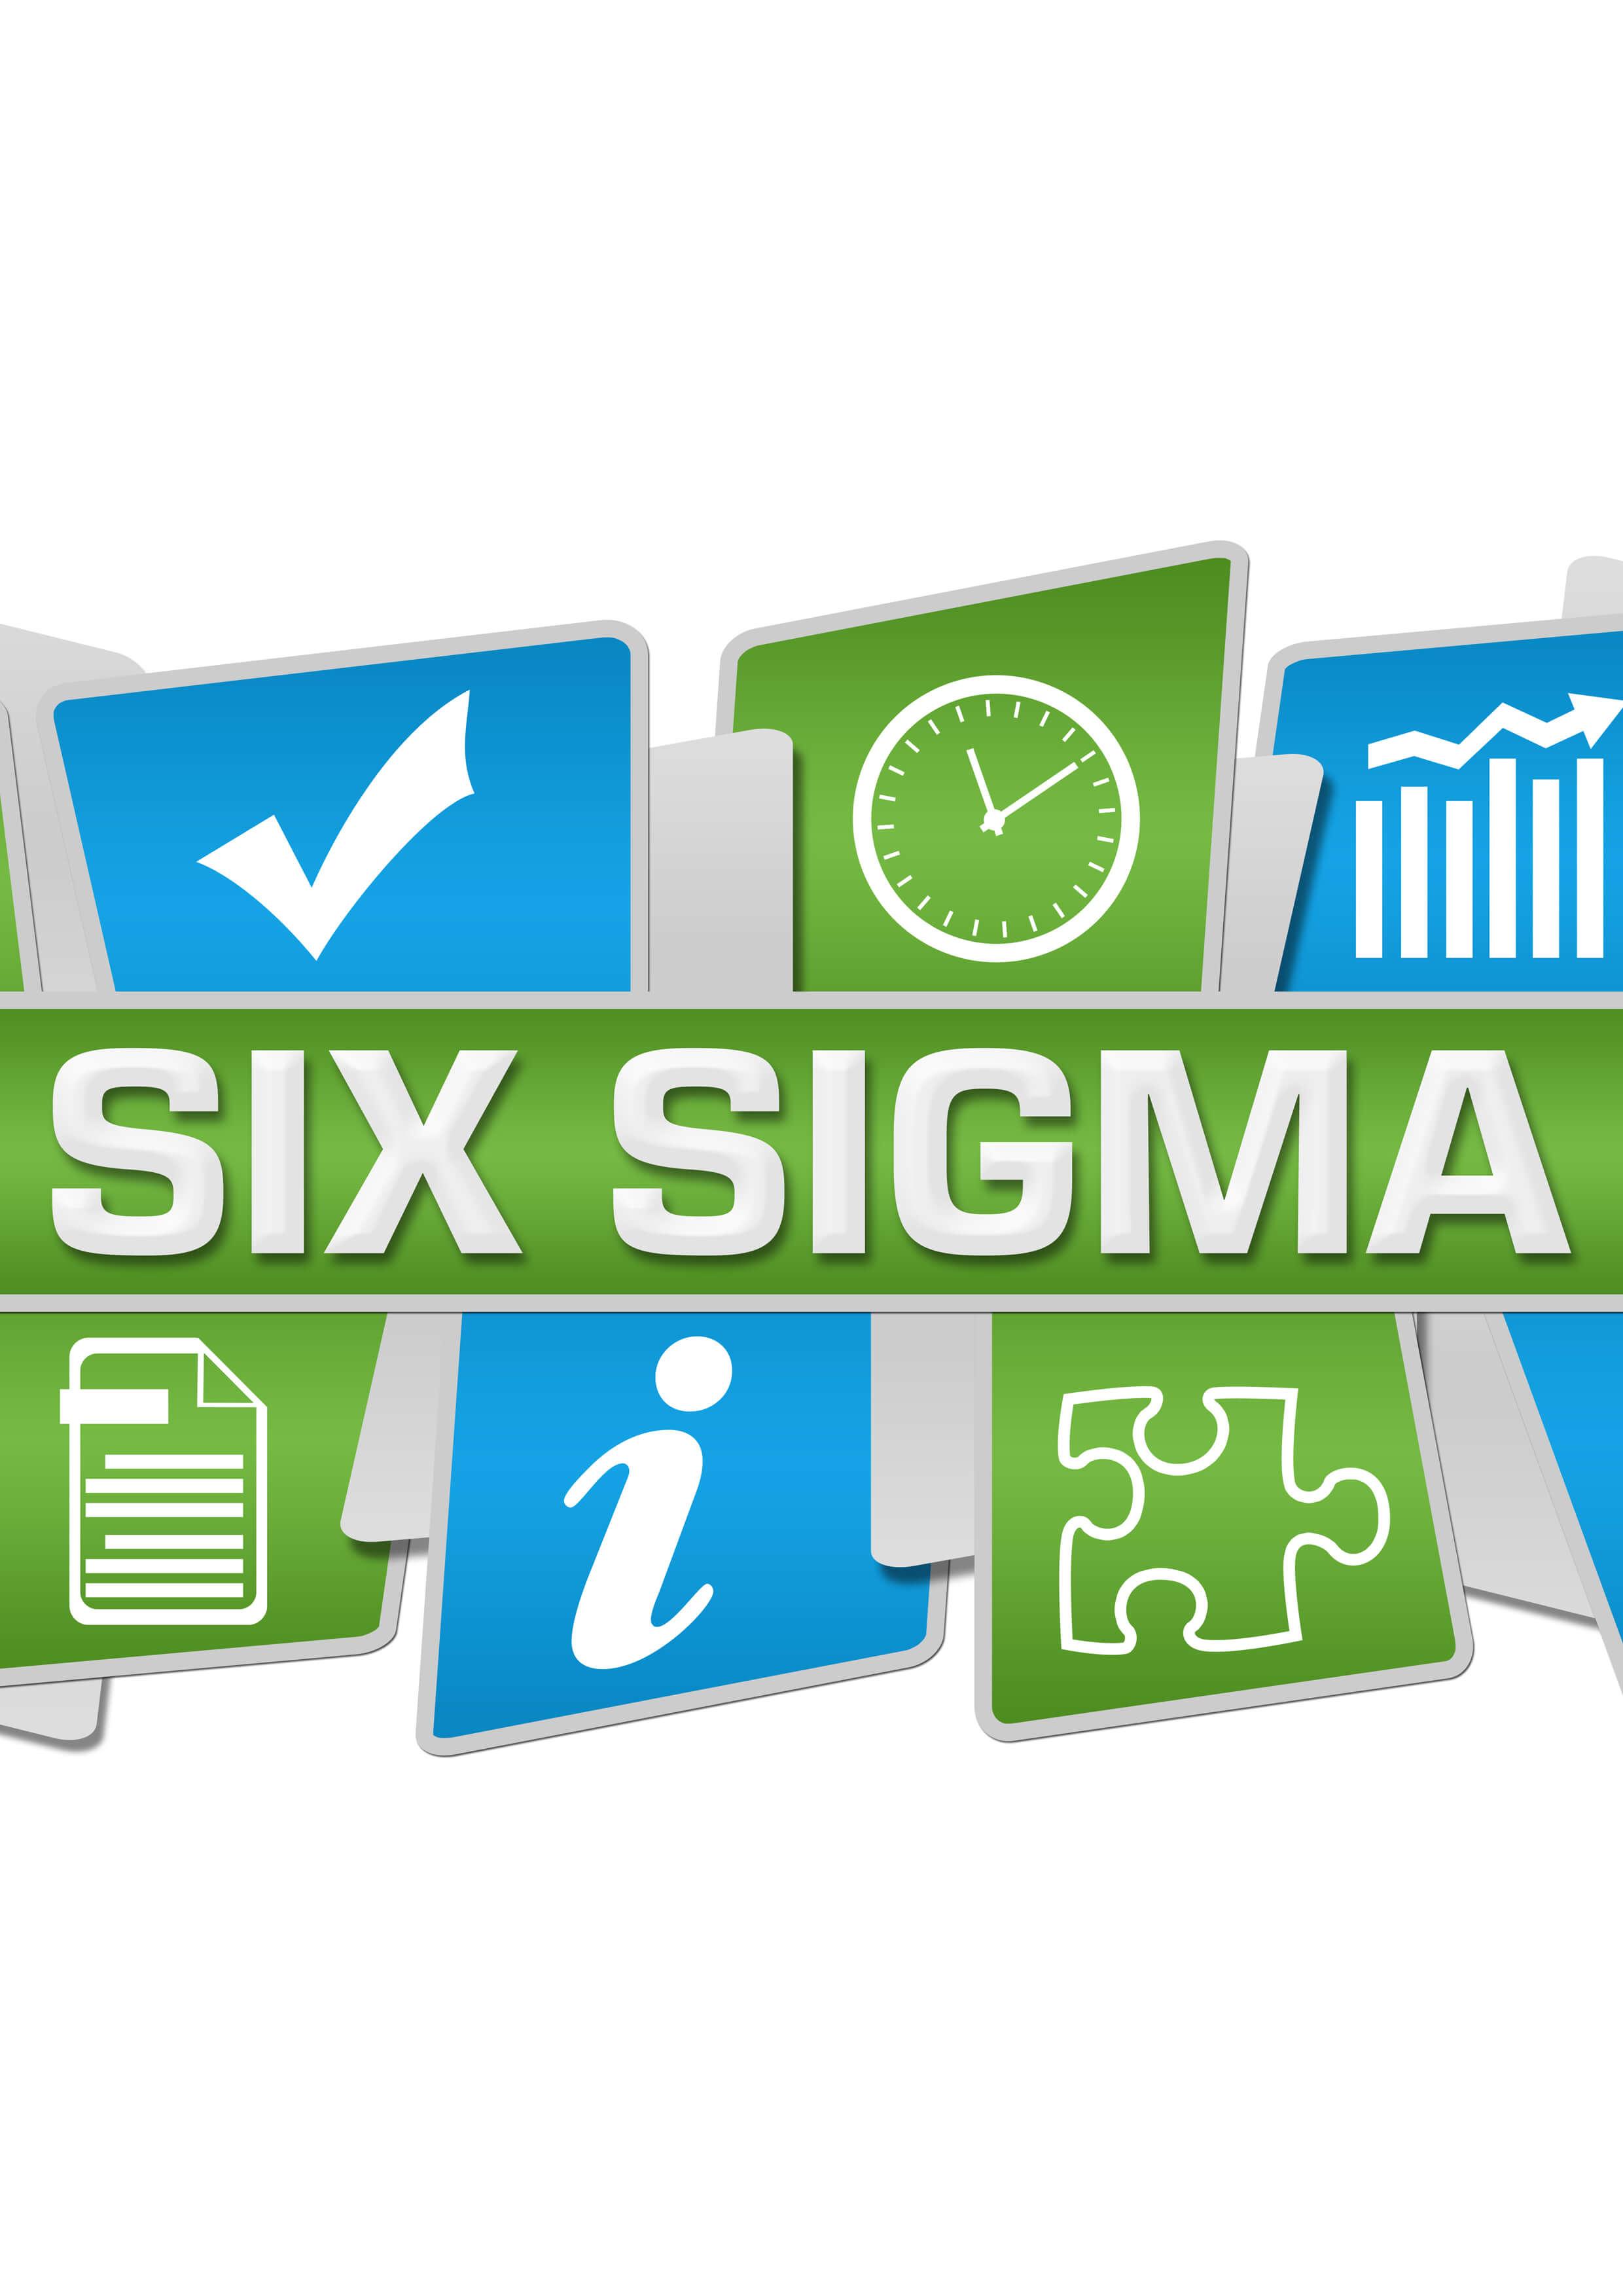 Certified Lean Six Sigma Green Belt Training Courses Dubai Meirc